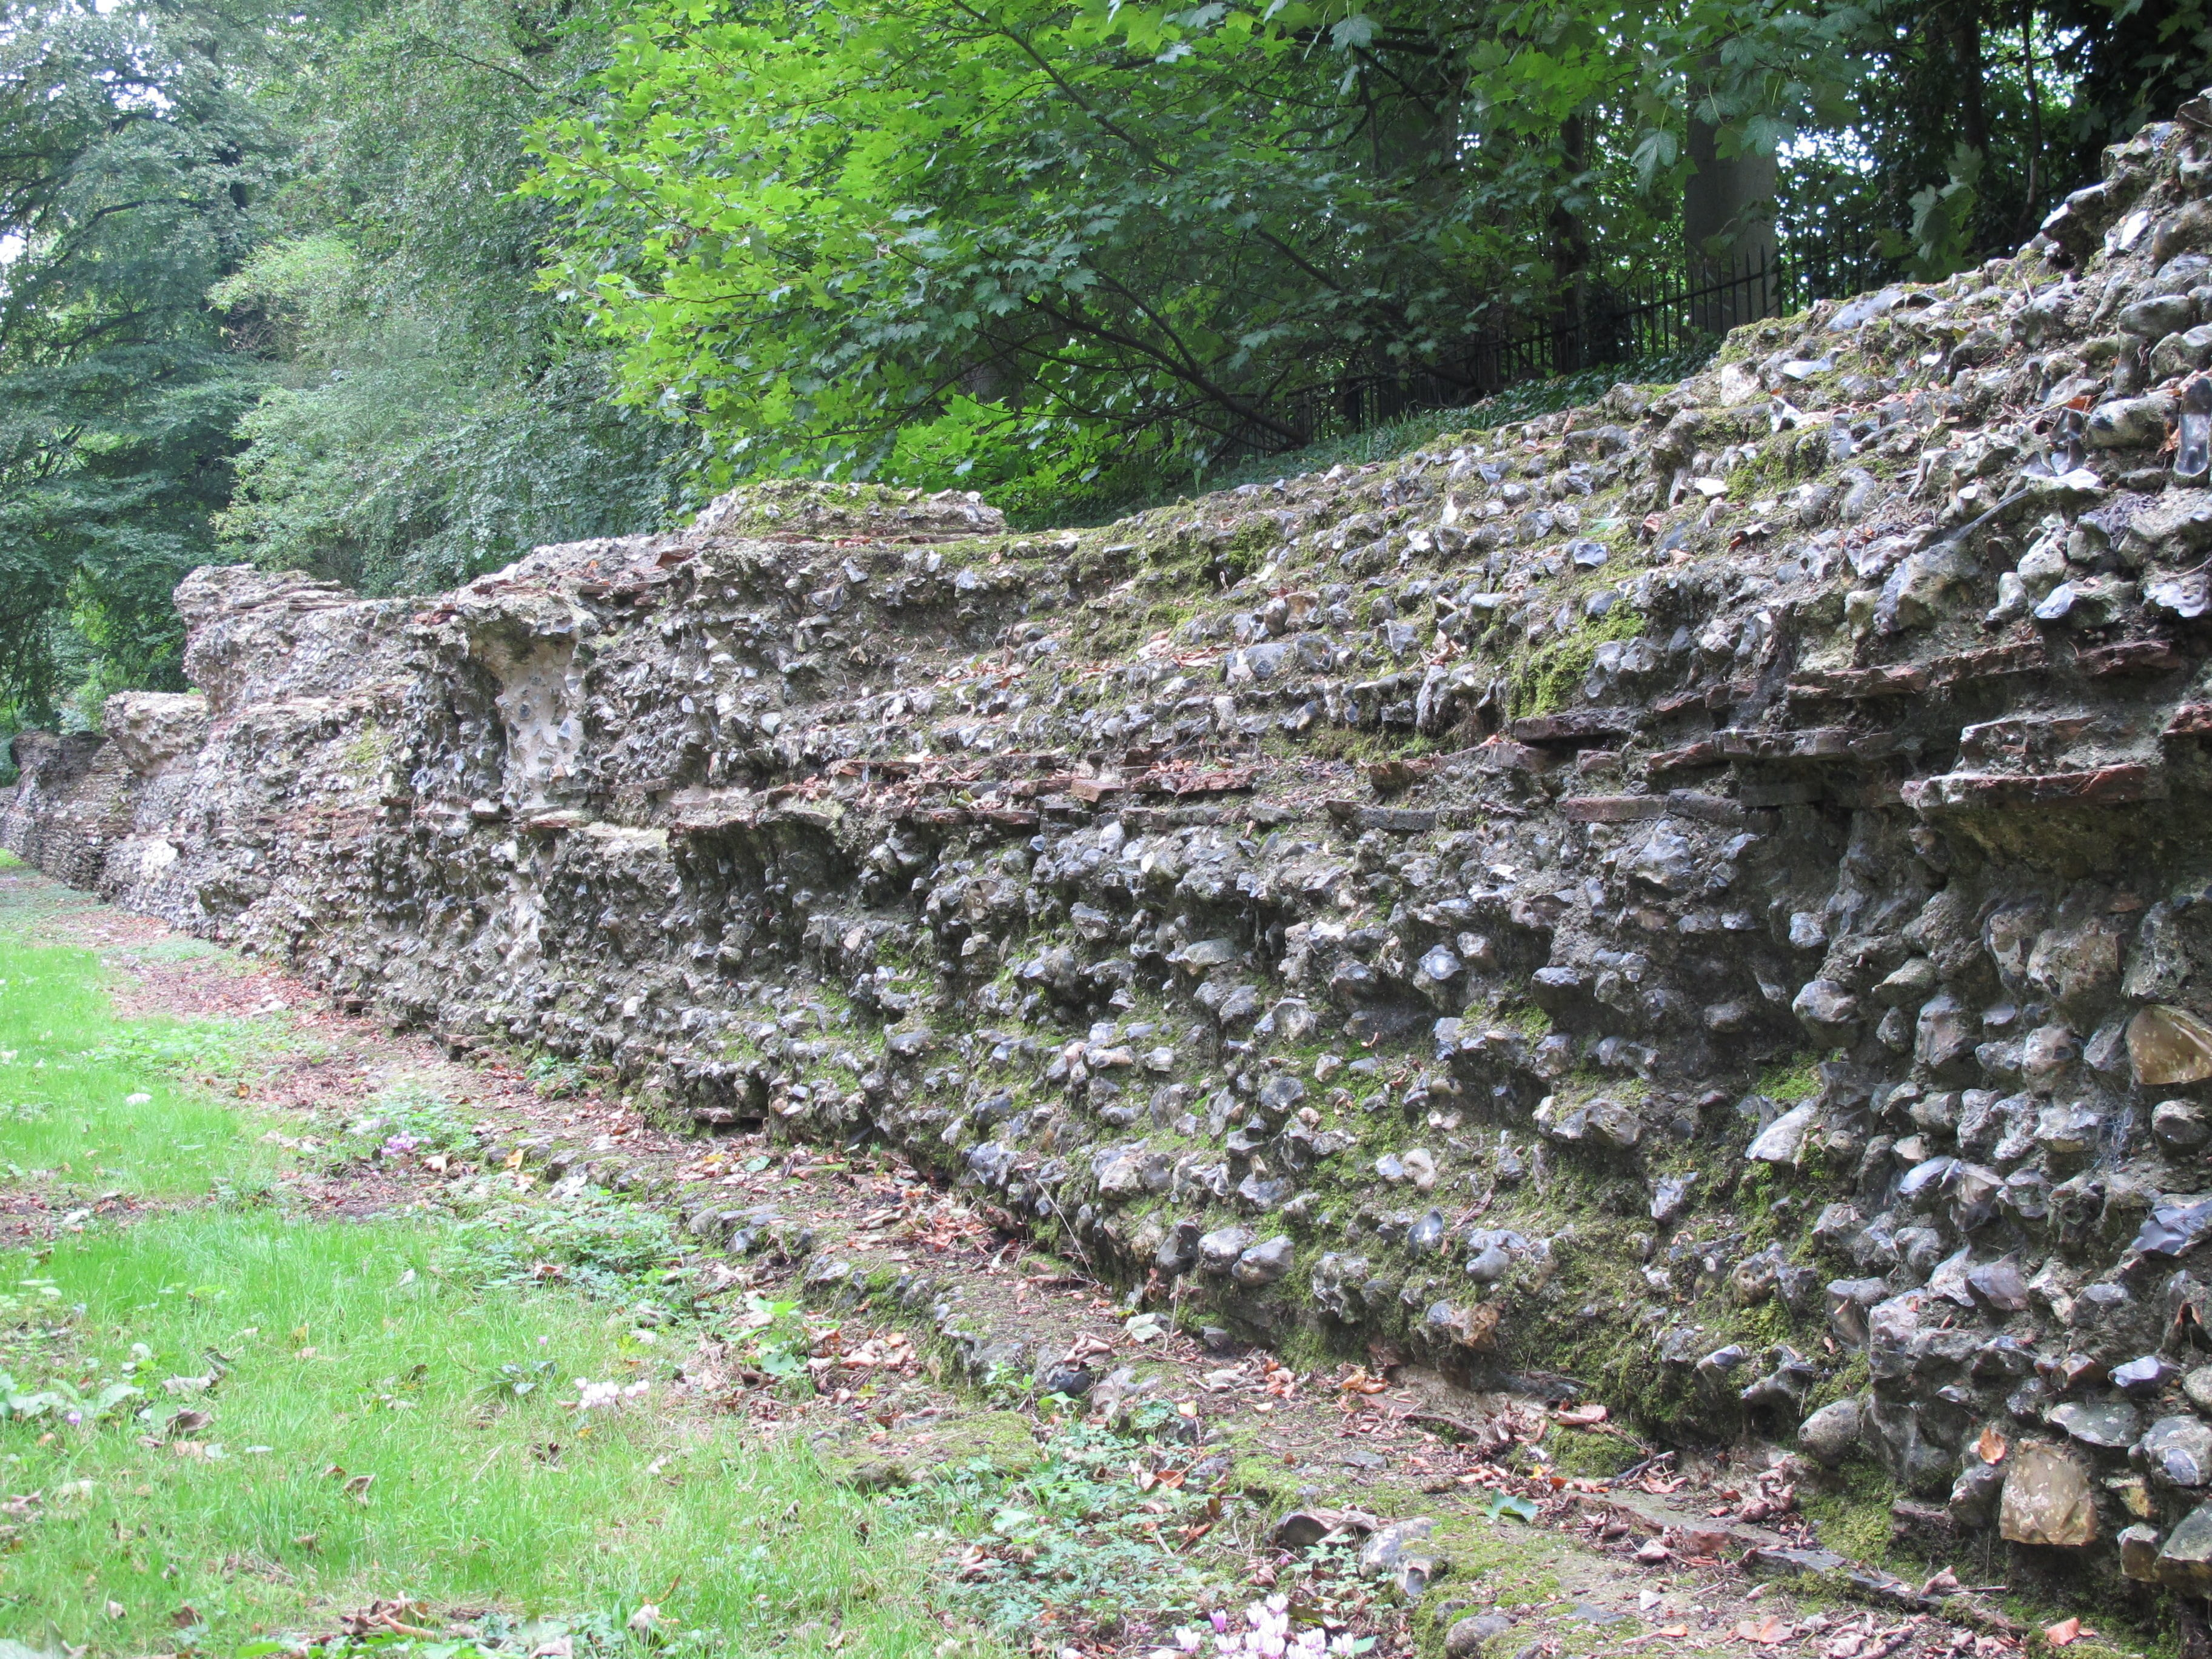 Mury obronne w Verulamium